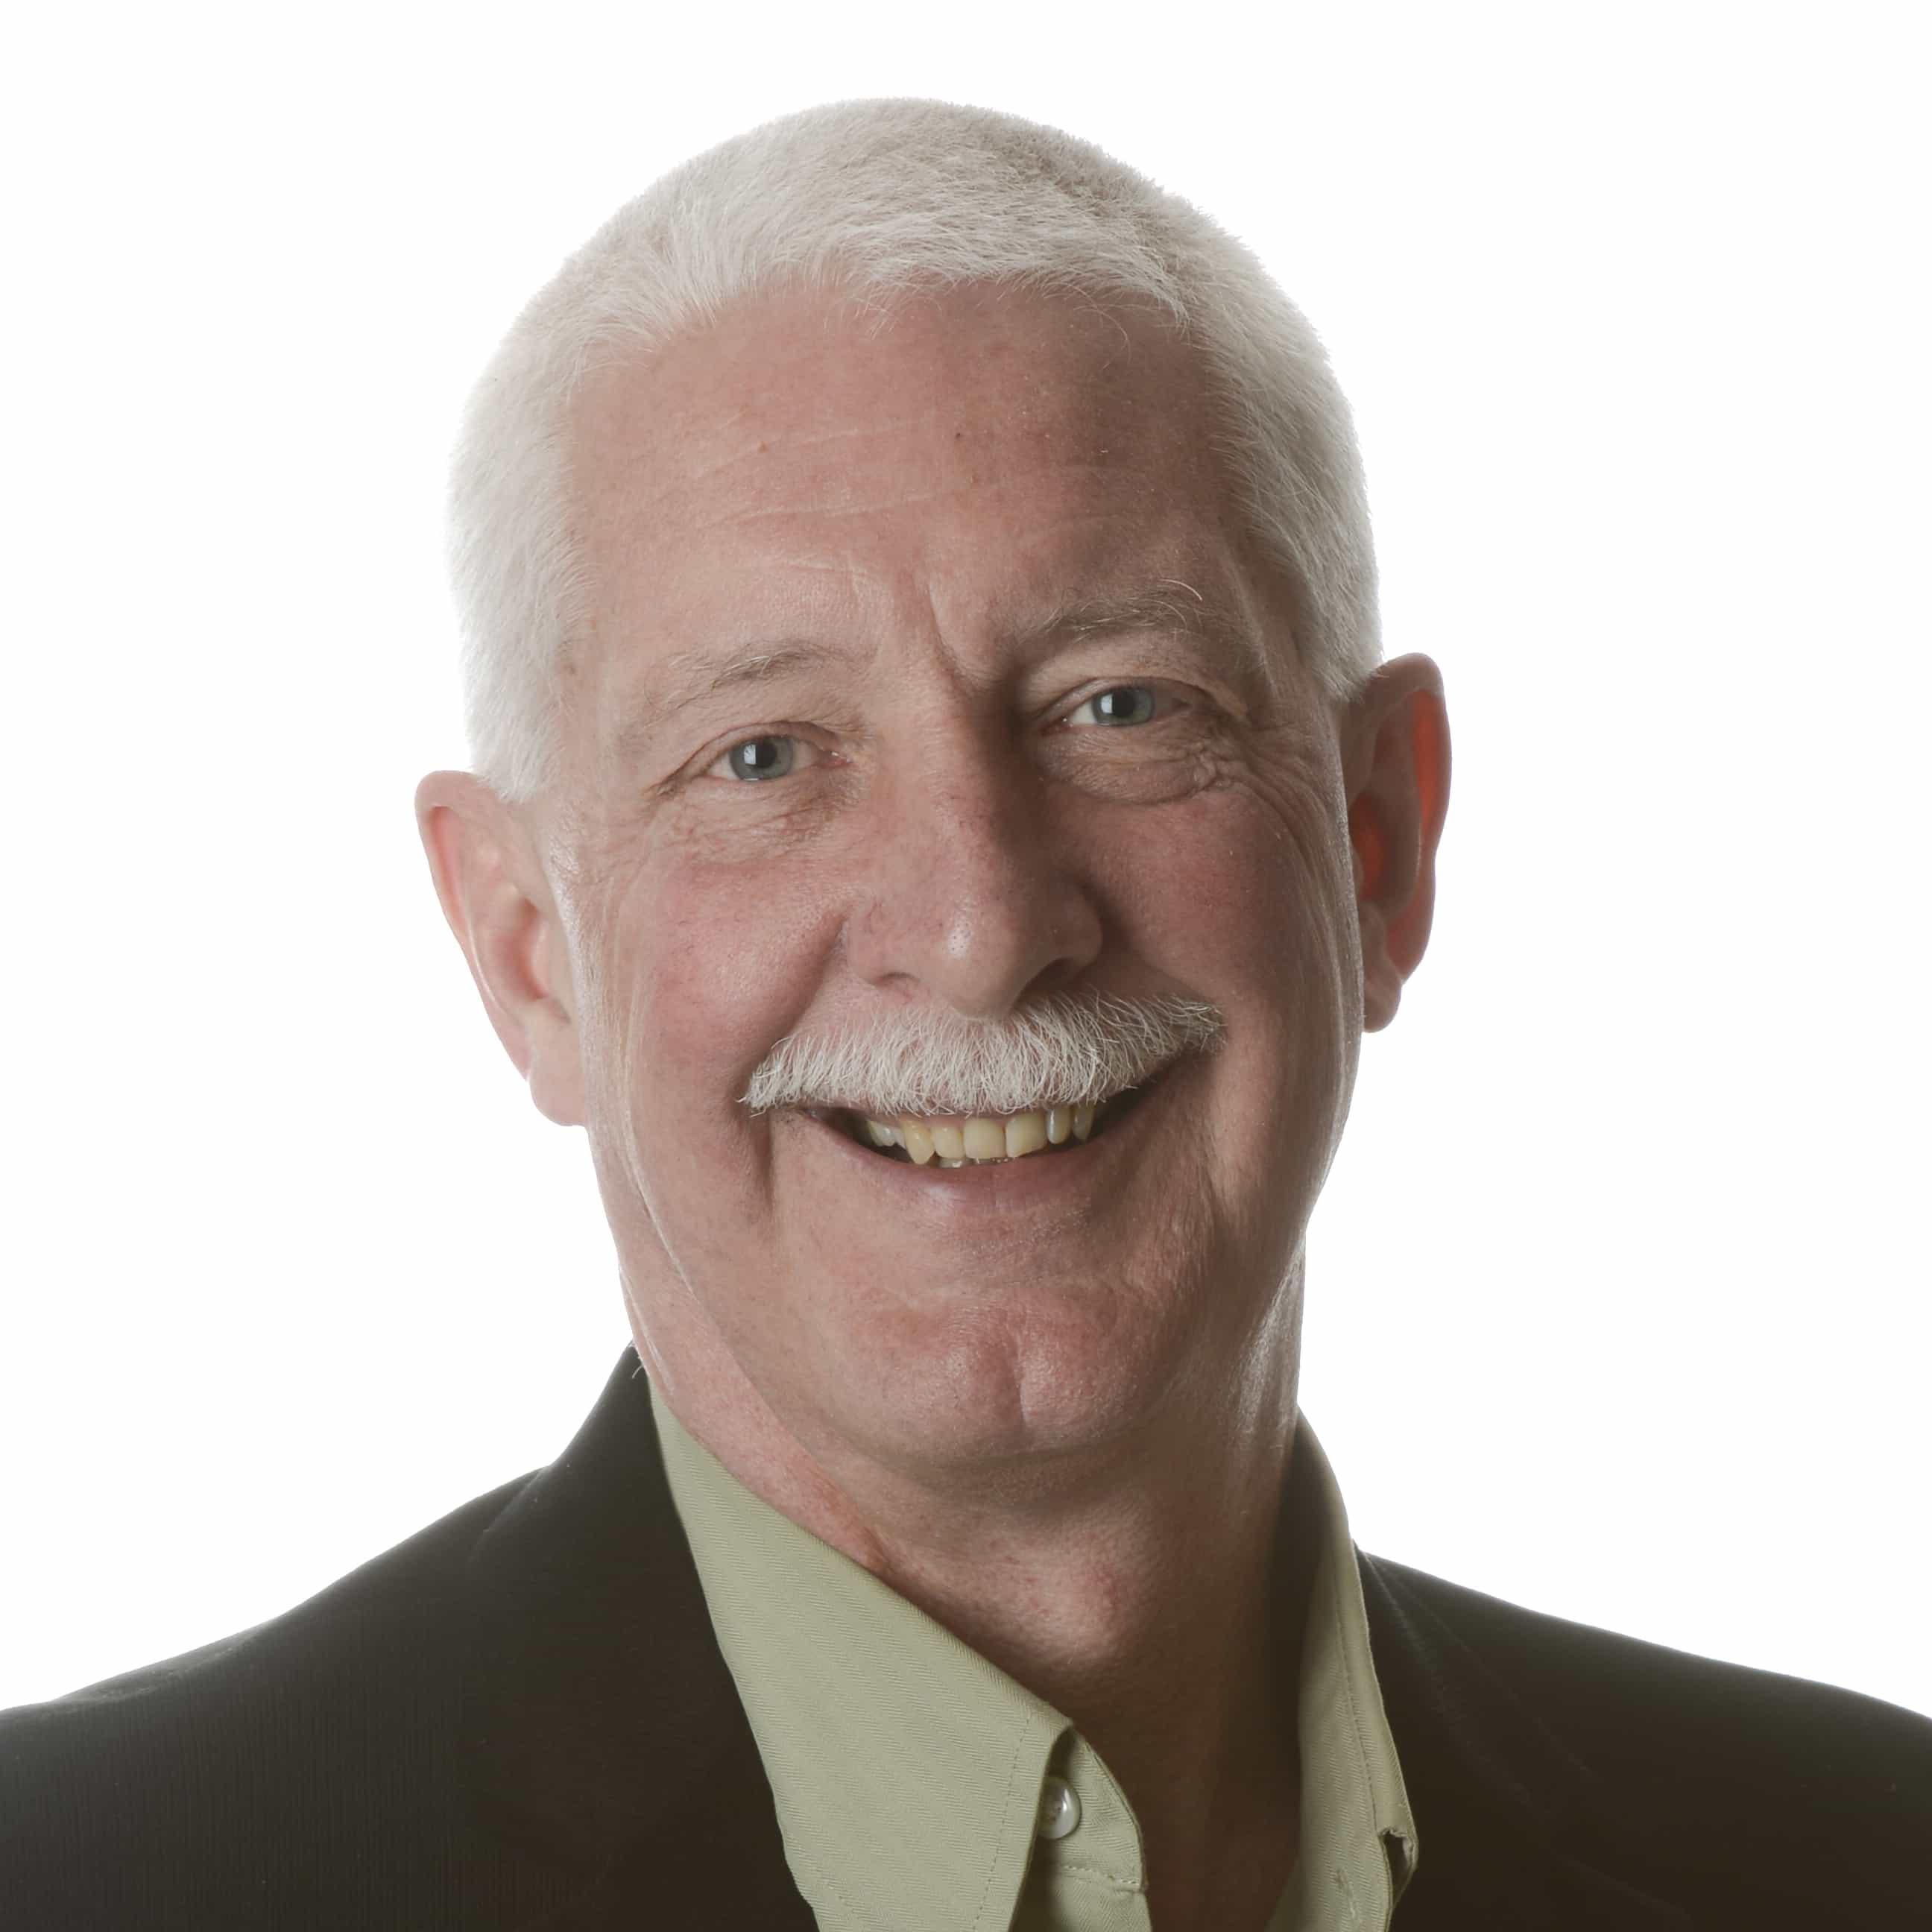 Robert J. Anderson Headshot